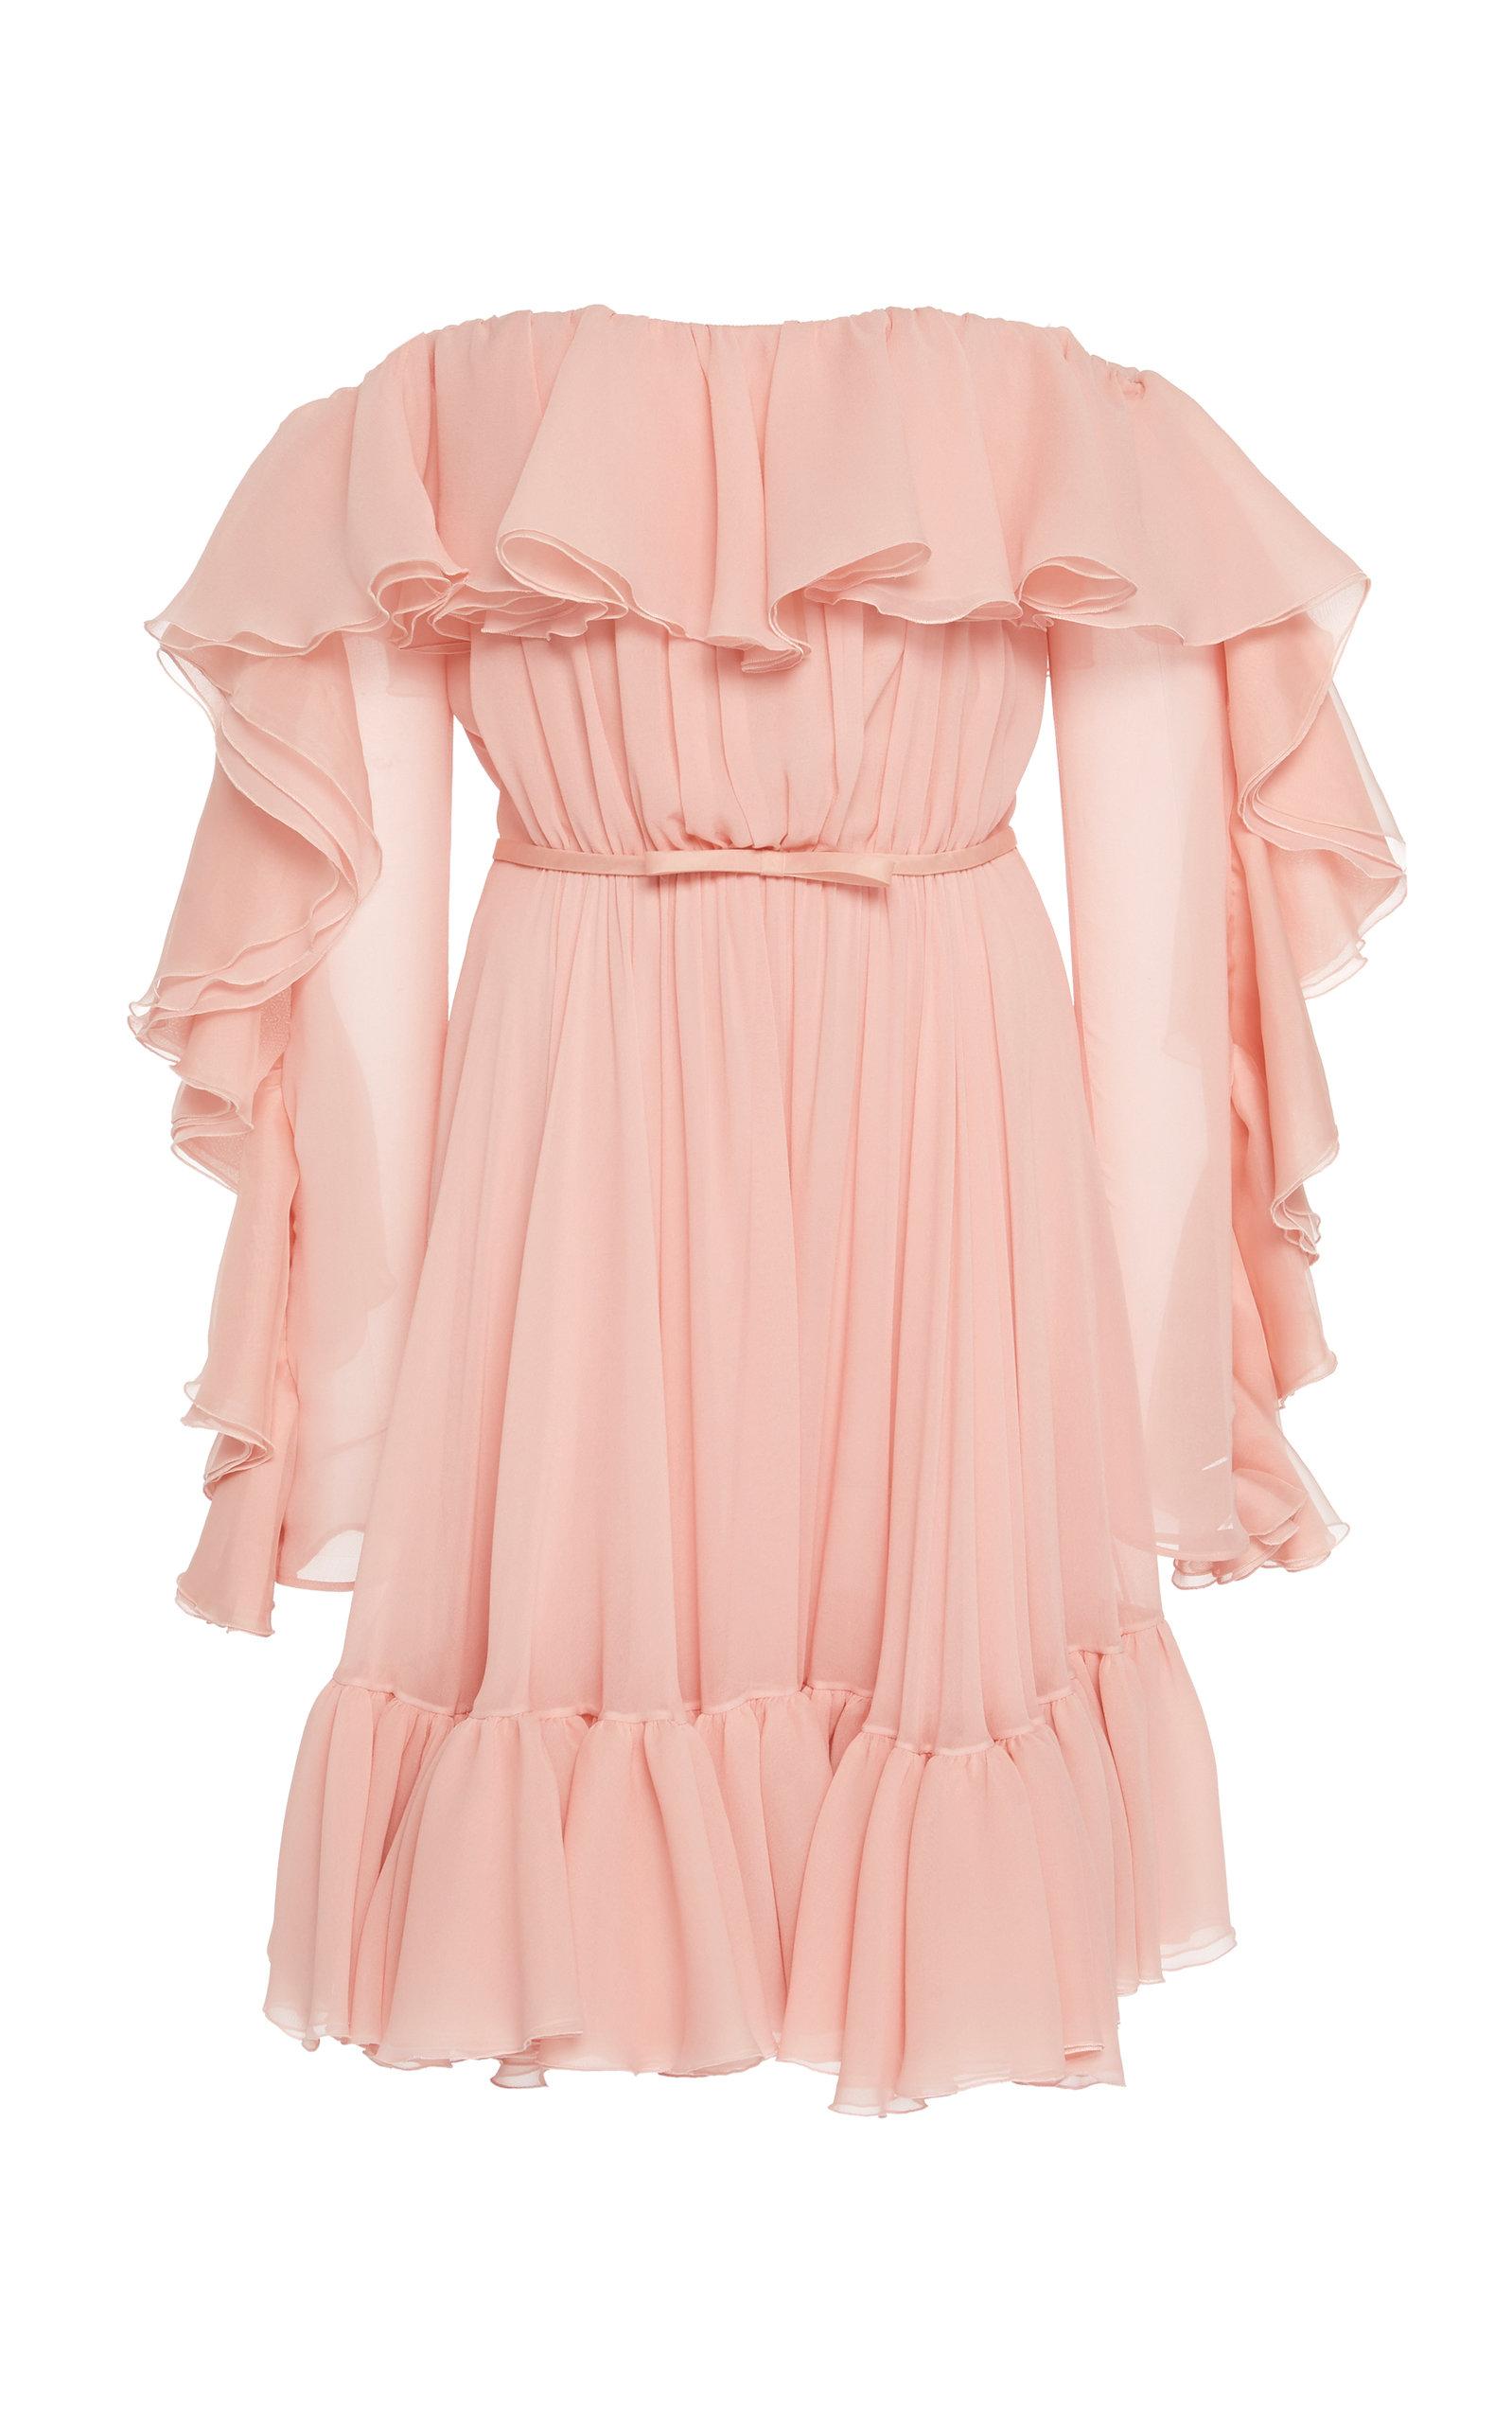 Buy Giambattista Valli Off-The-Shoulder Ruffled Silk-Chiffon Mini Dress online, shop Giambattista Valli at the best price